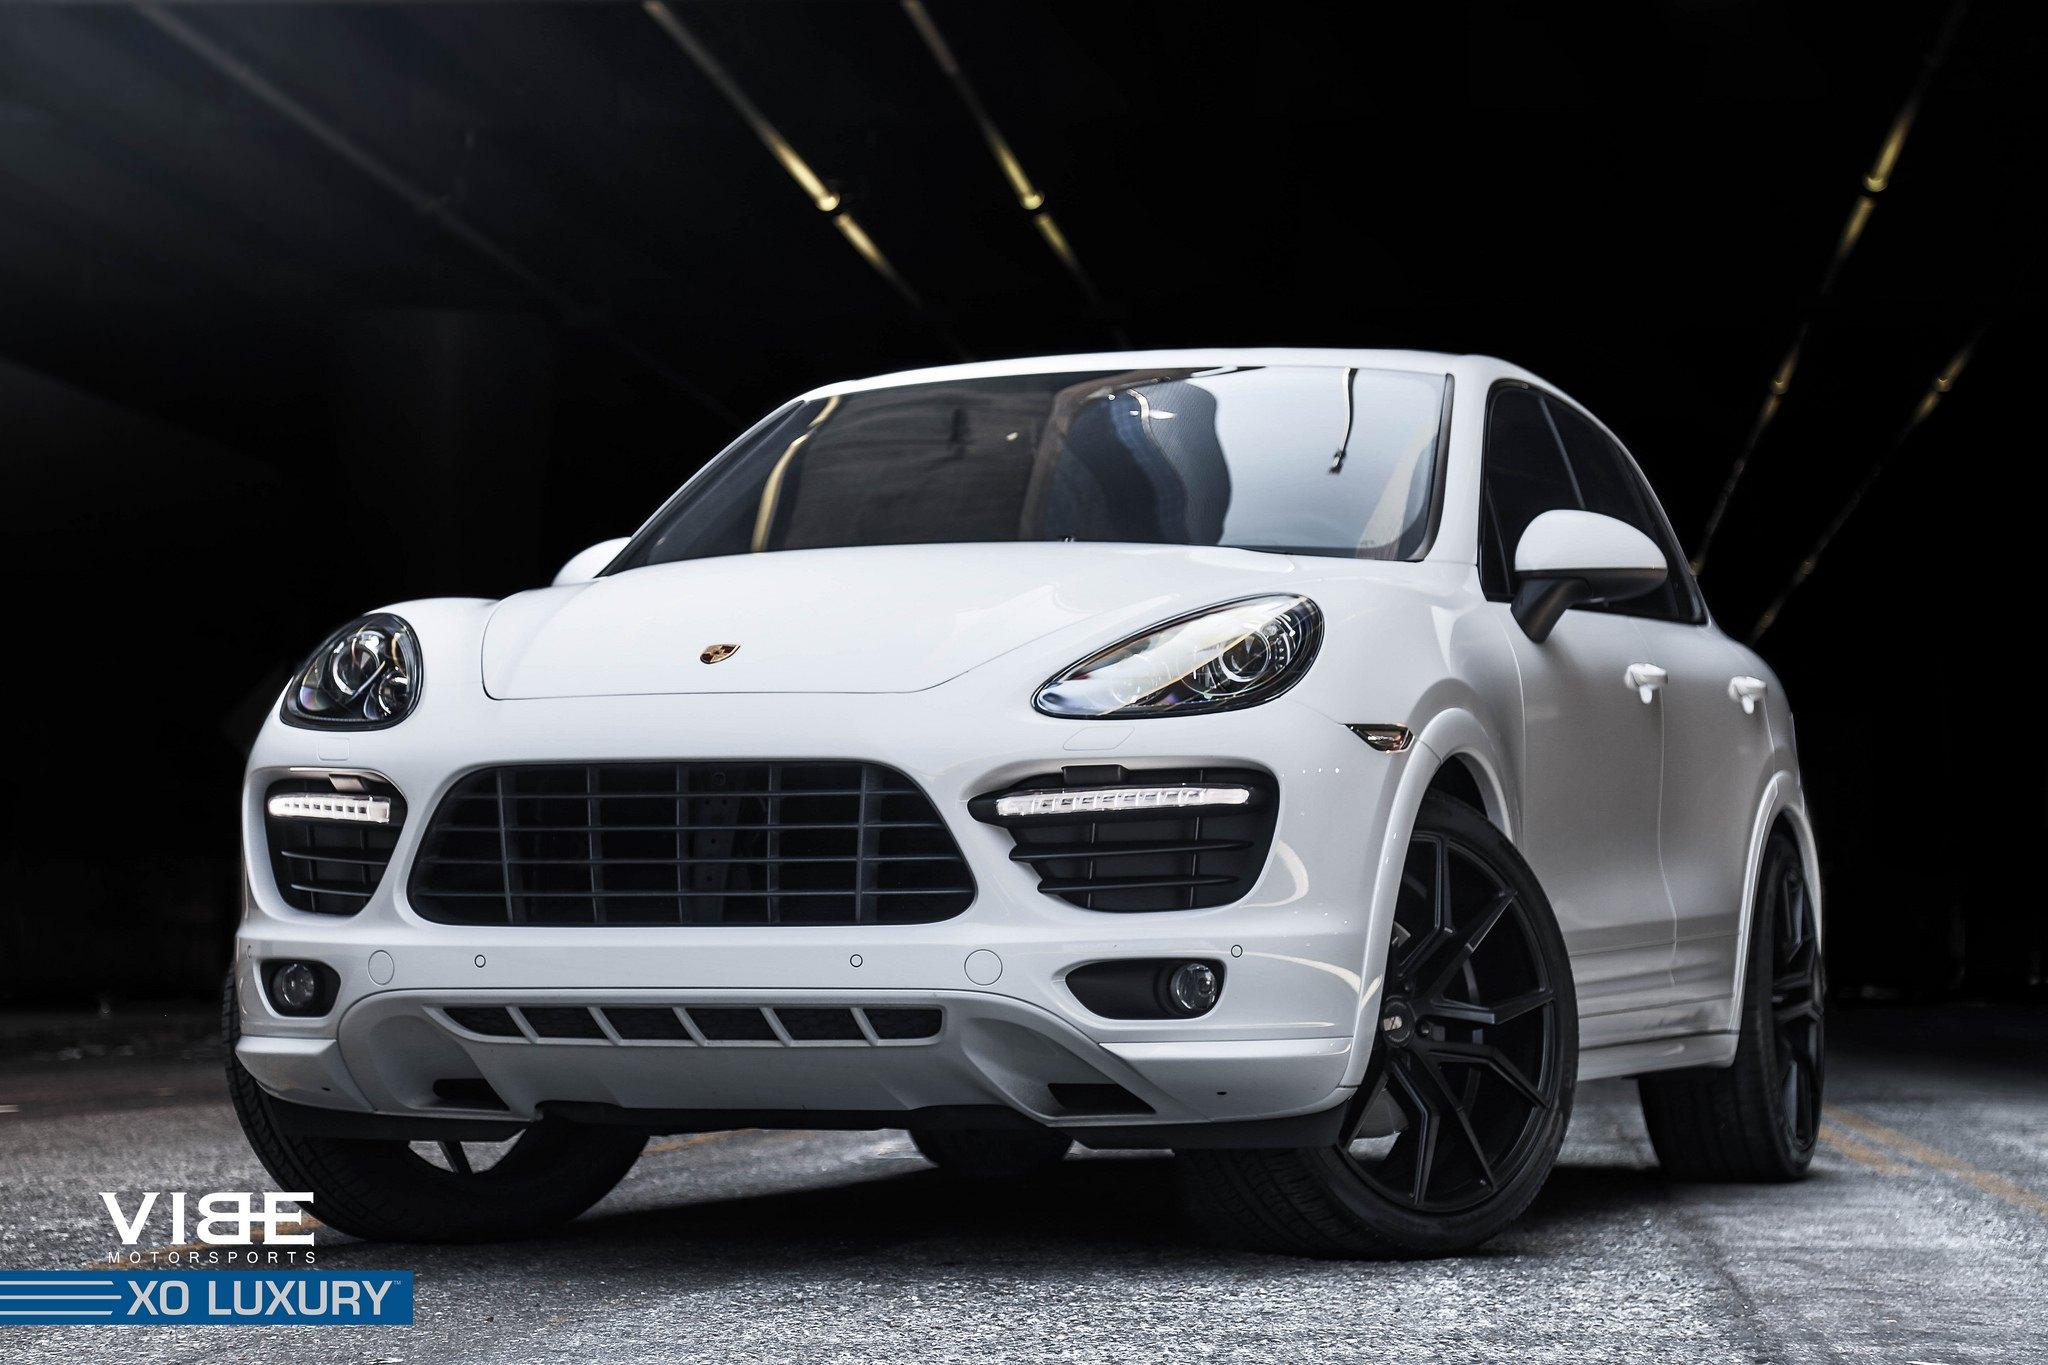 Black Verona Rims By Xo Luxury On Porsche Cayenne Gts Carid Com Gallery